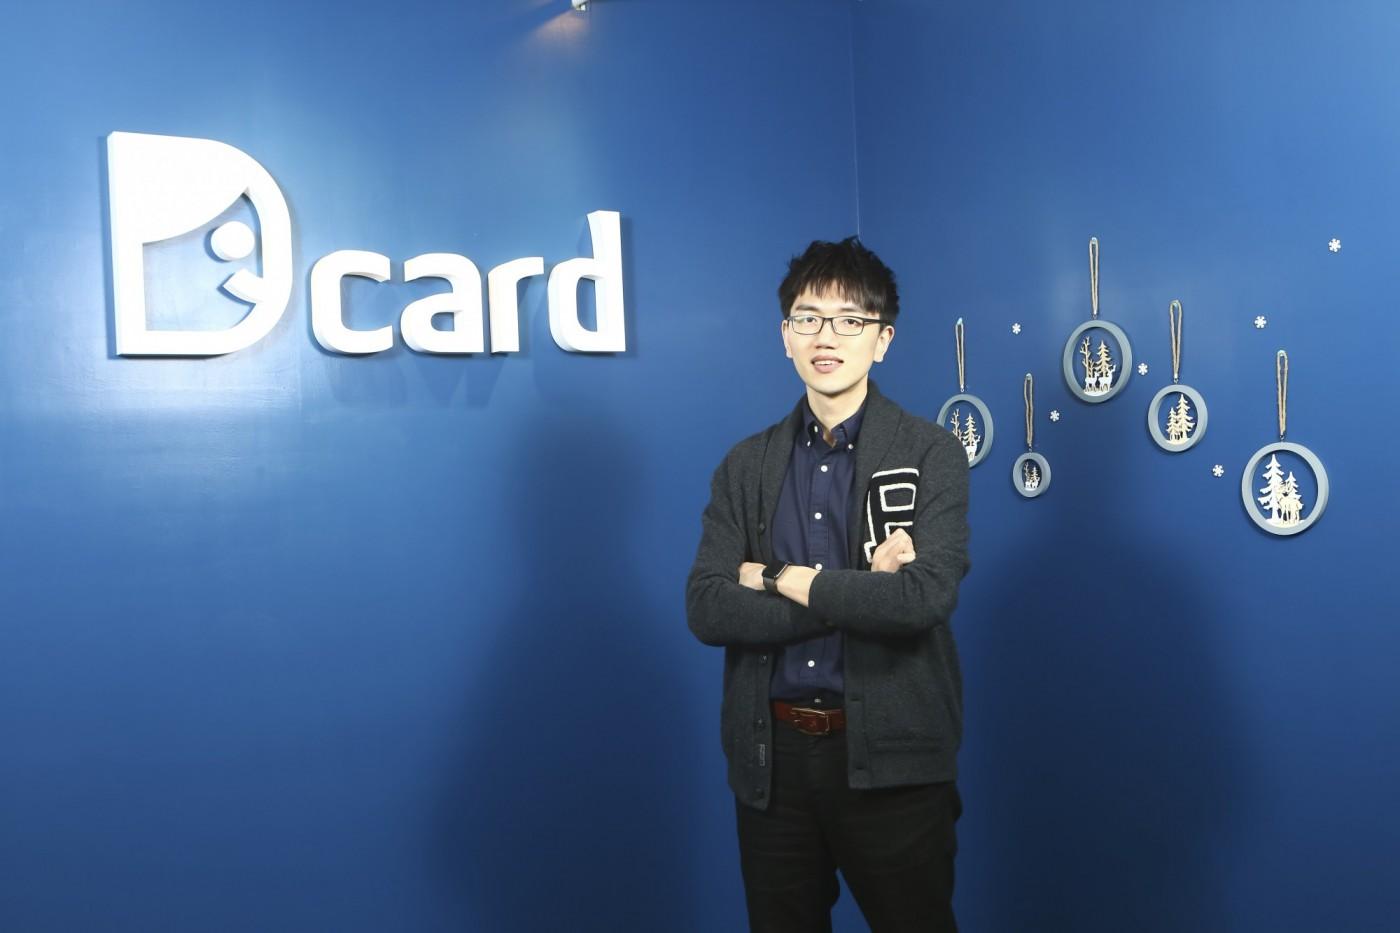 Dcard員工為何敢拒絕CEO要求?全因這個績效管理法